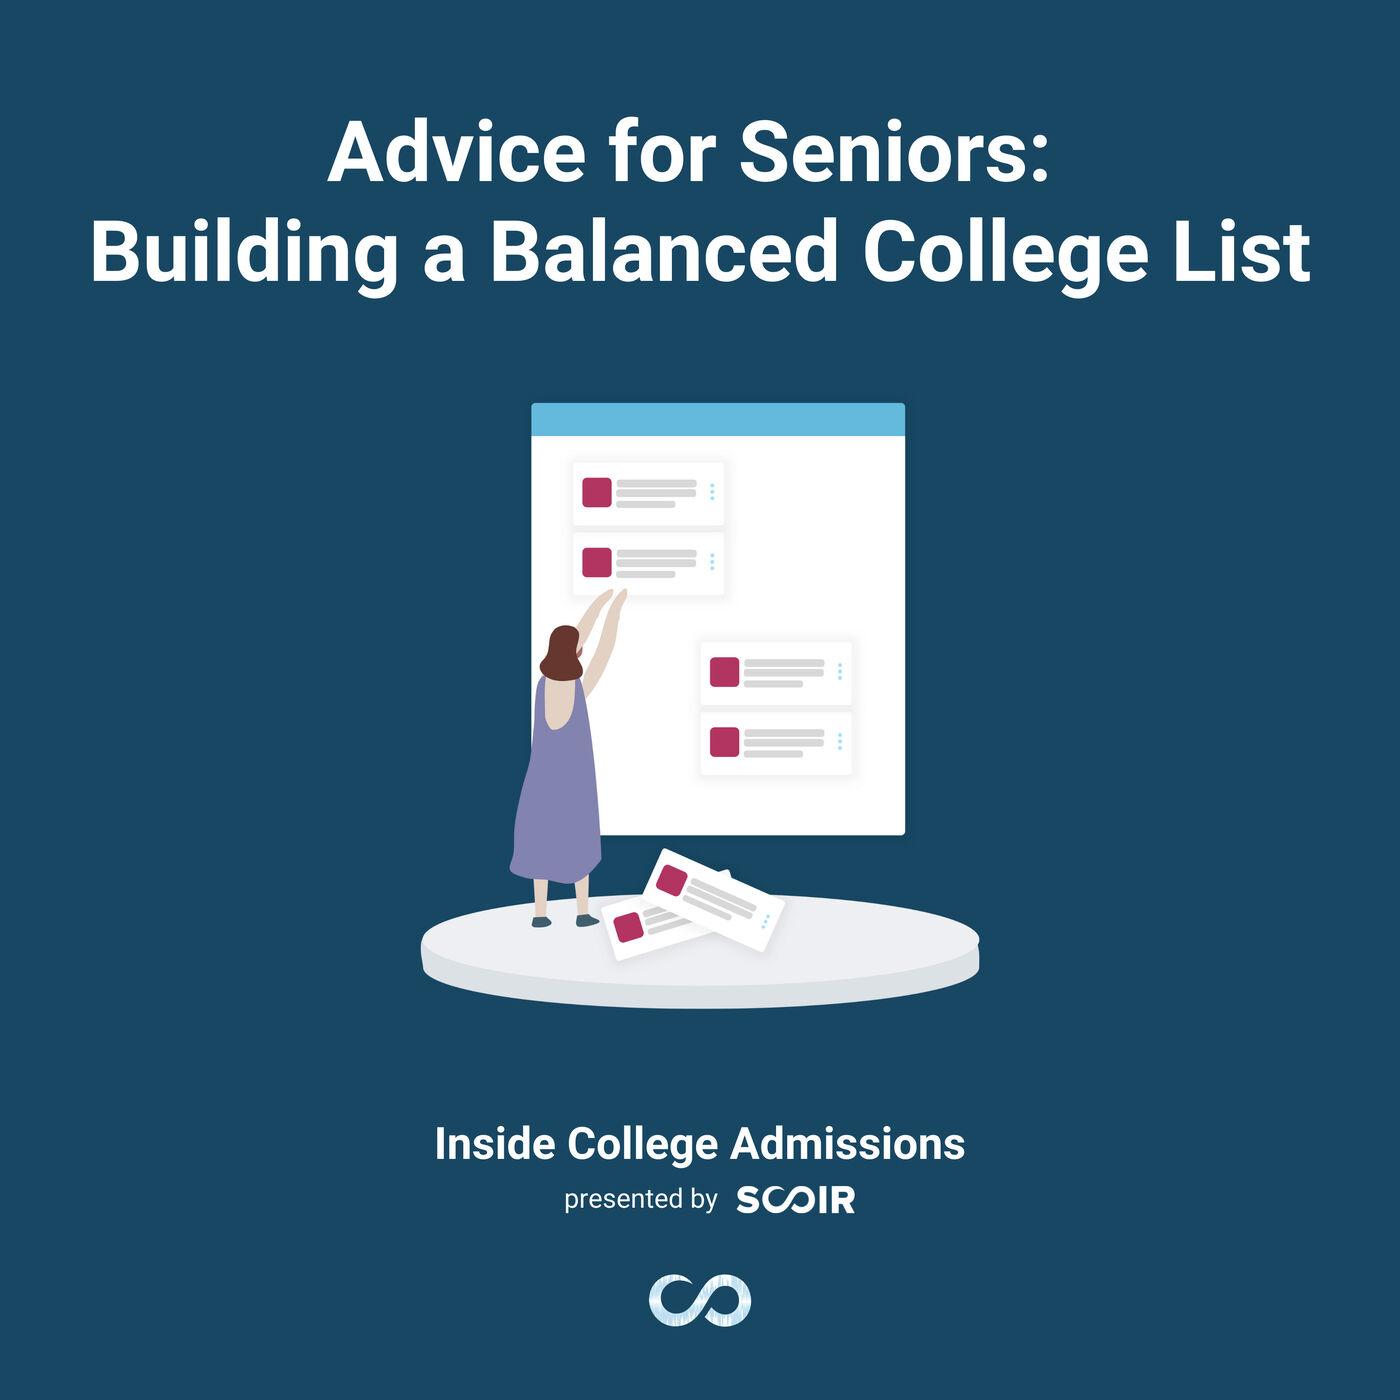 Advice for Seniors: Building a Balanced College List